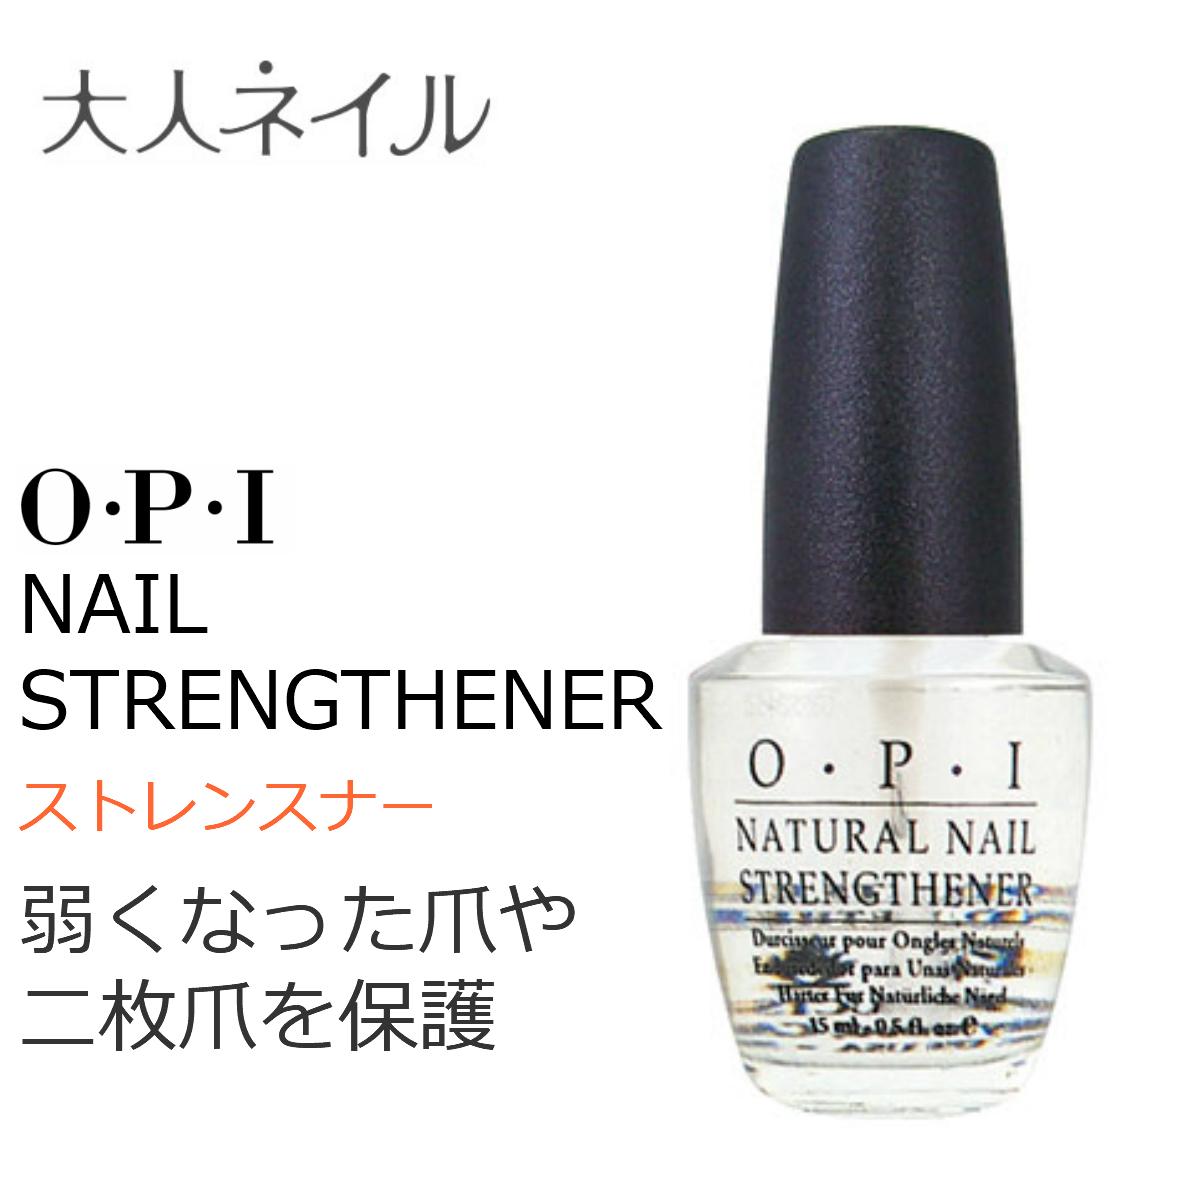 OPI オーピーアイ ナチュラルネイルストレンスナー 爪強化剤 15ml 補強 保護 ギター 硬く マニキュア ベースコート セルフネイル